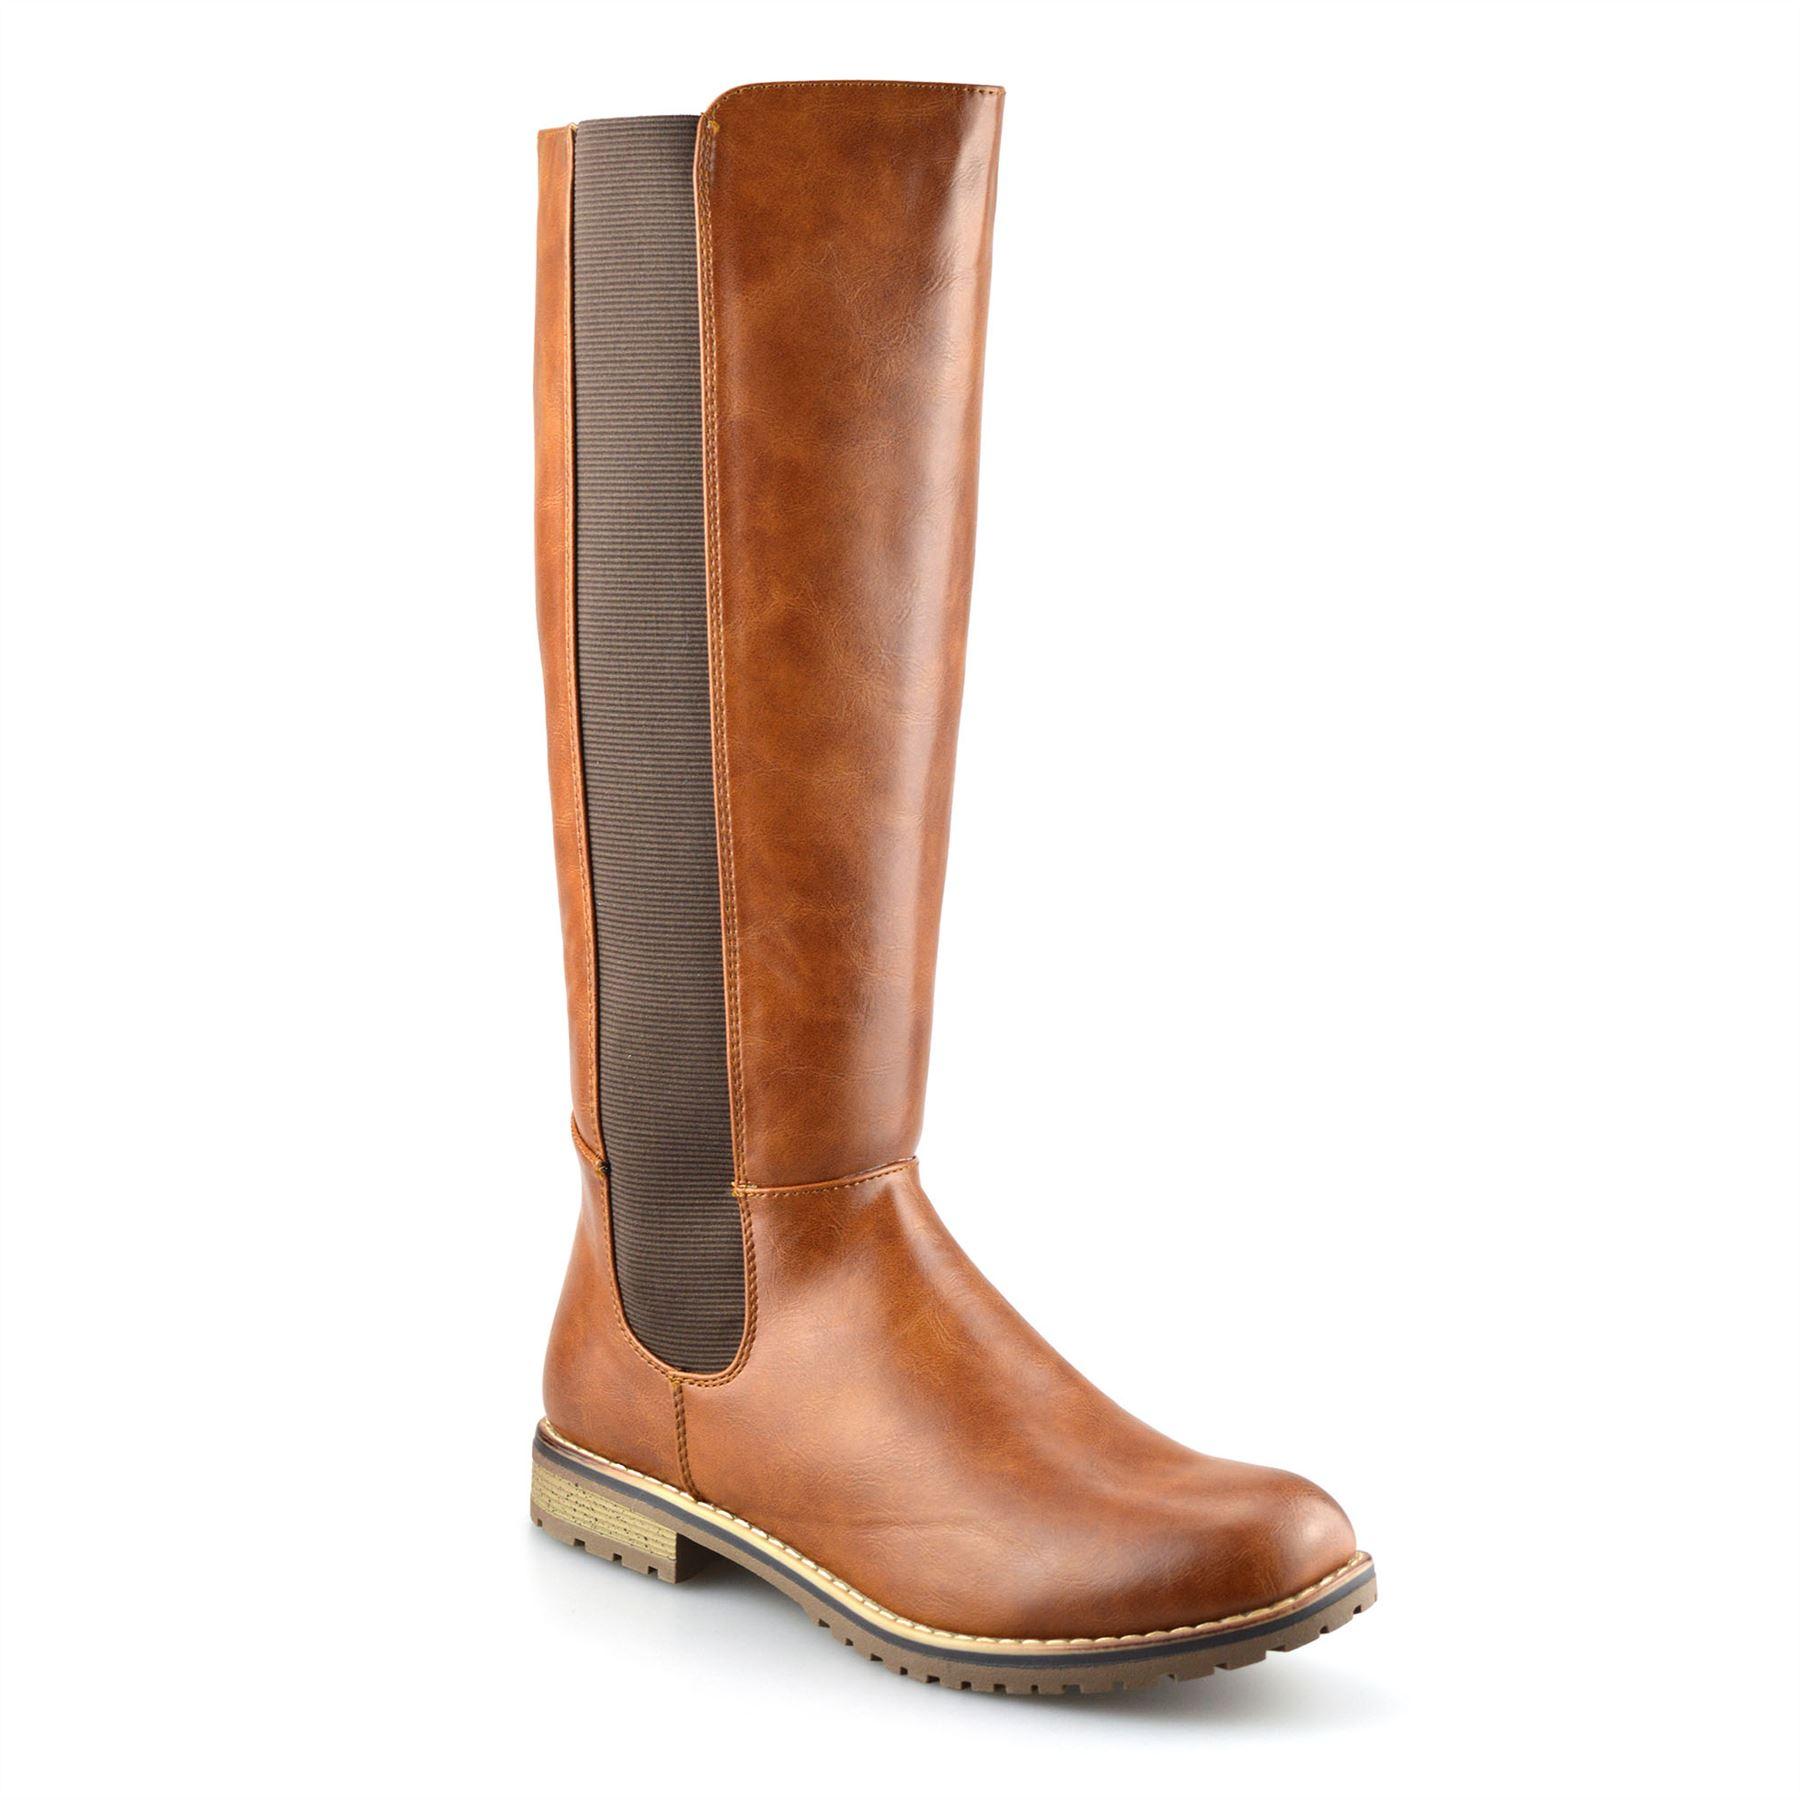 Ladies Womens Knee High Flat Heel Zip Up Winter Riding Biker Boots Shoes Size